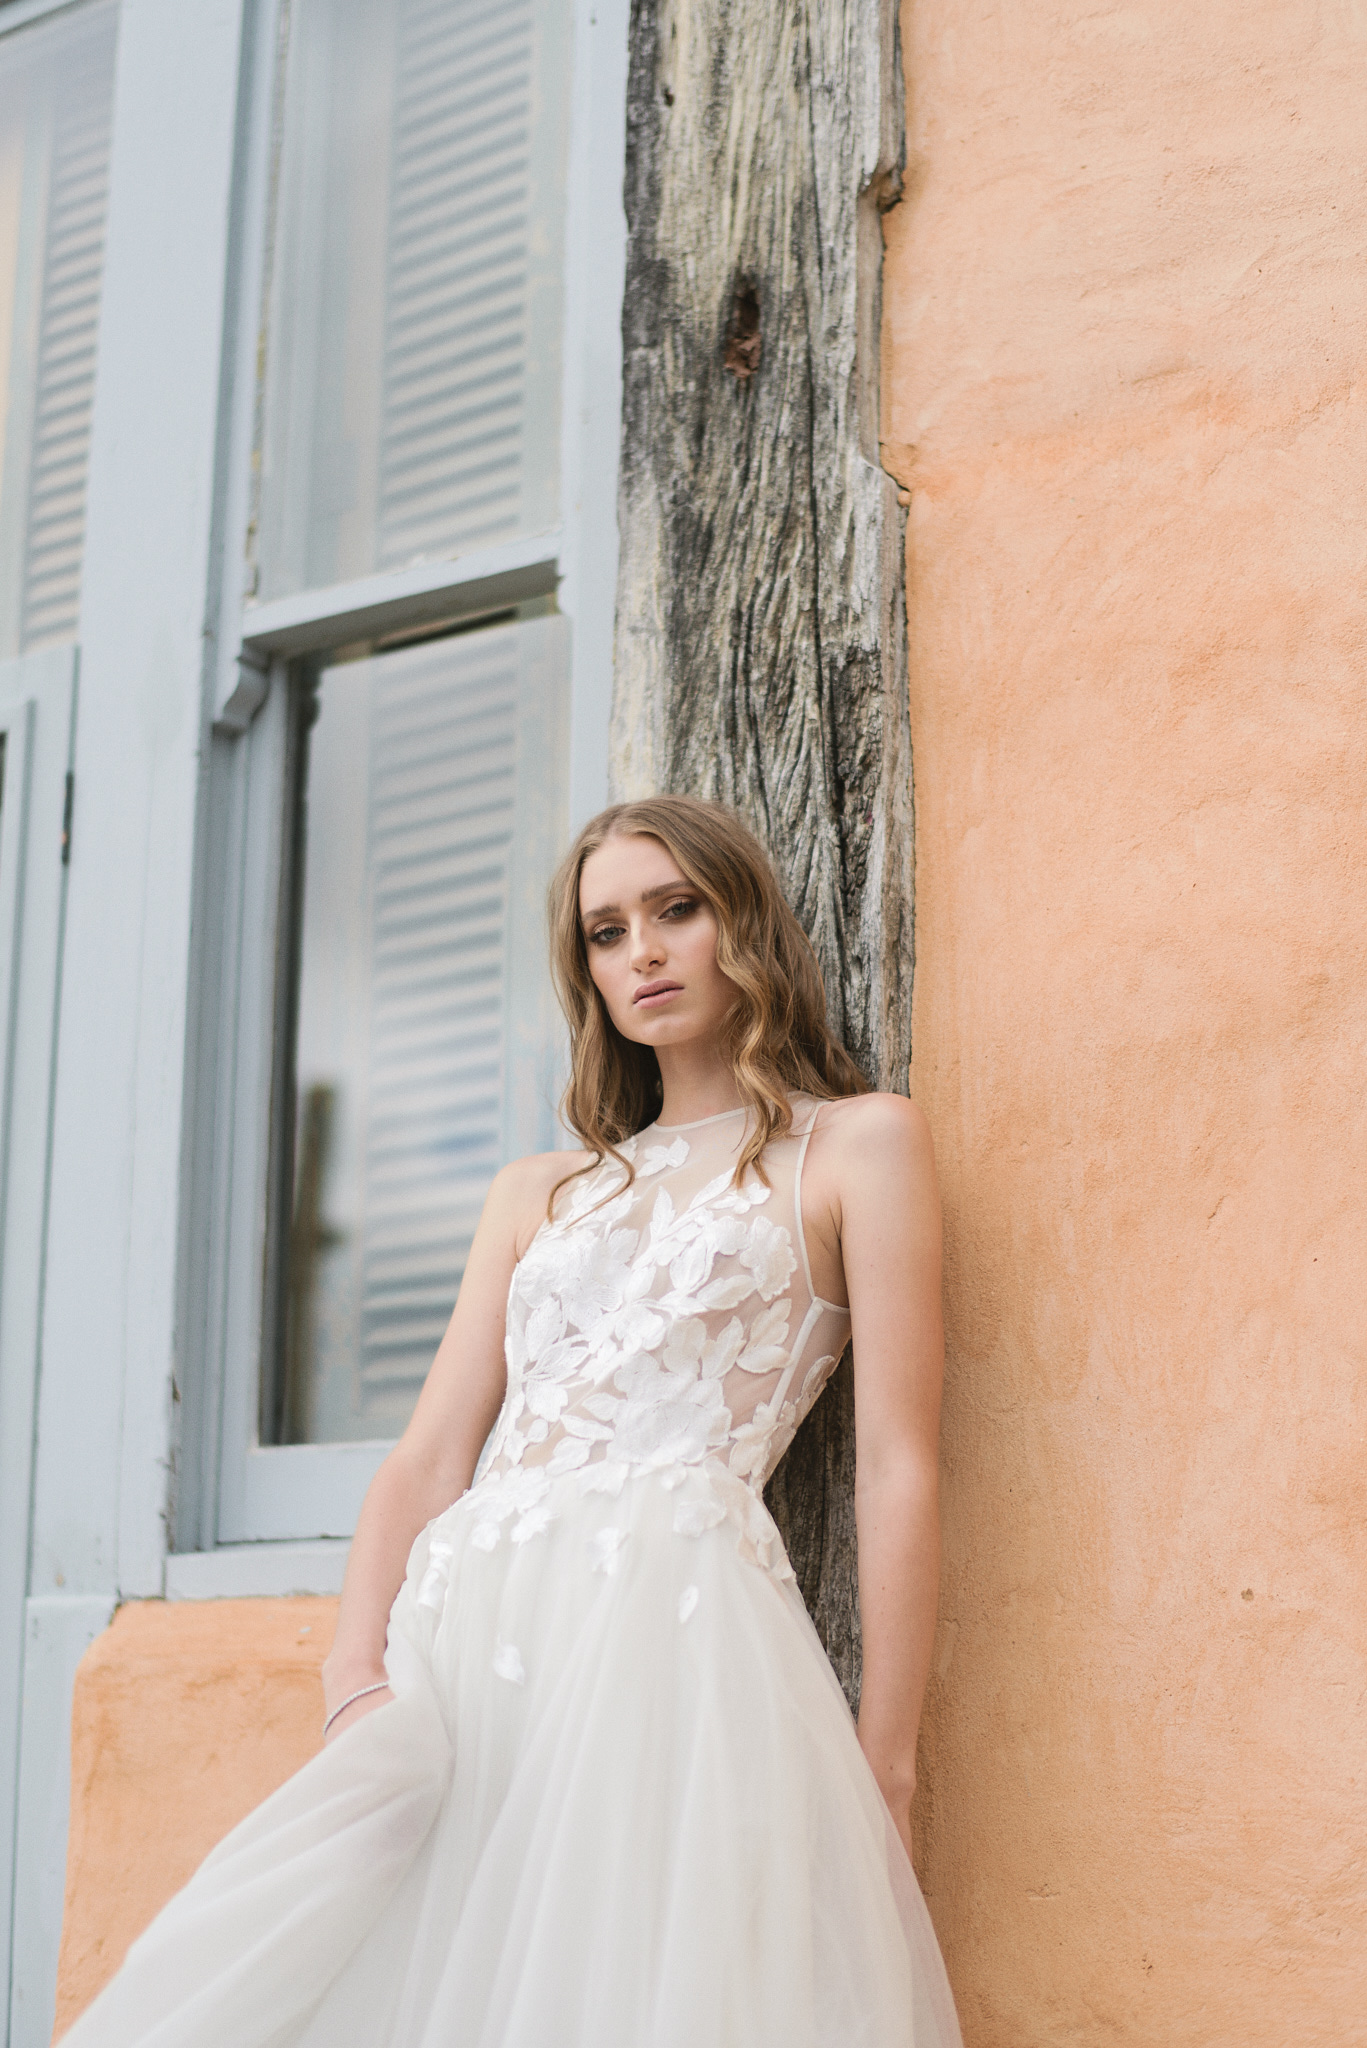 Sephory Photography - Romance is not dead 052 - Web.jpg